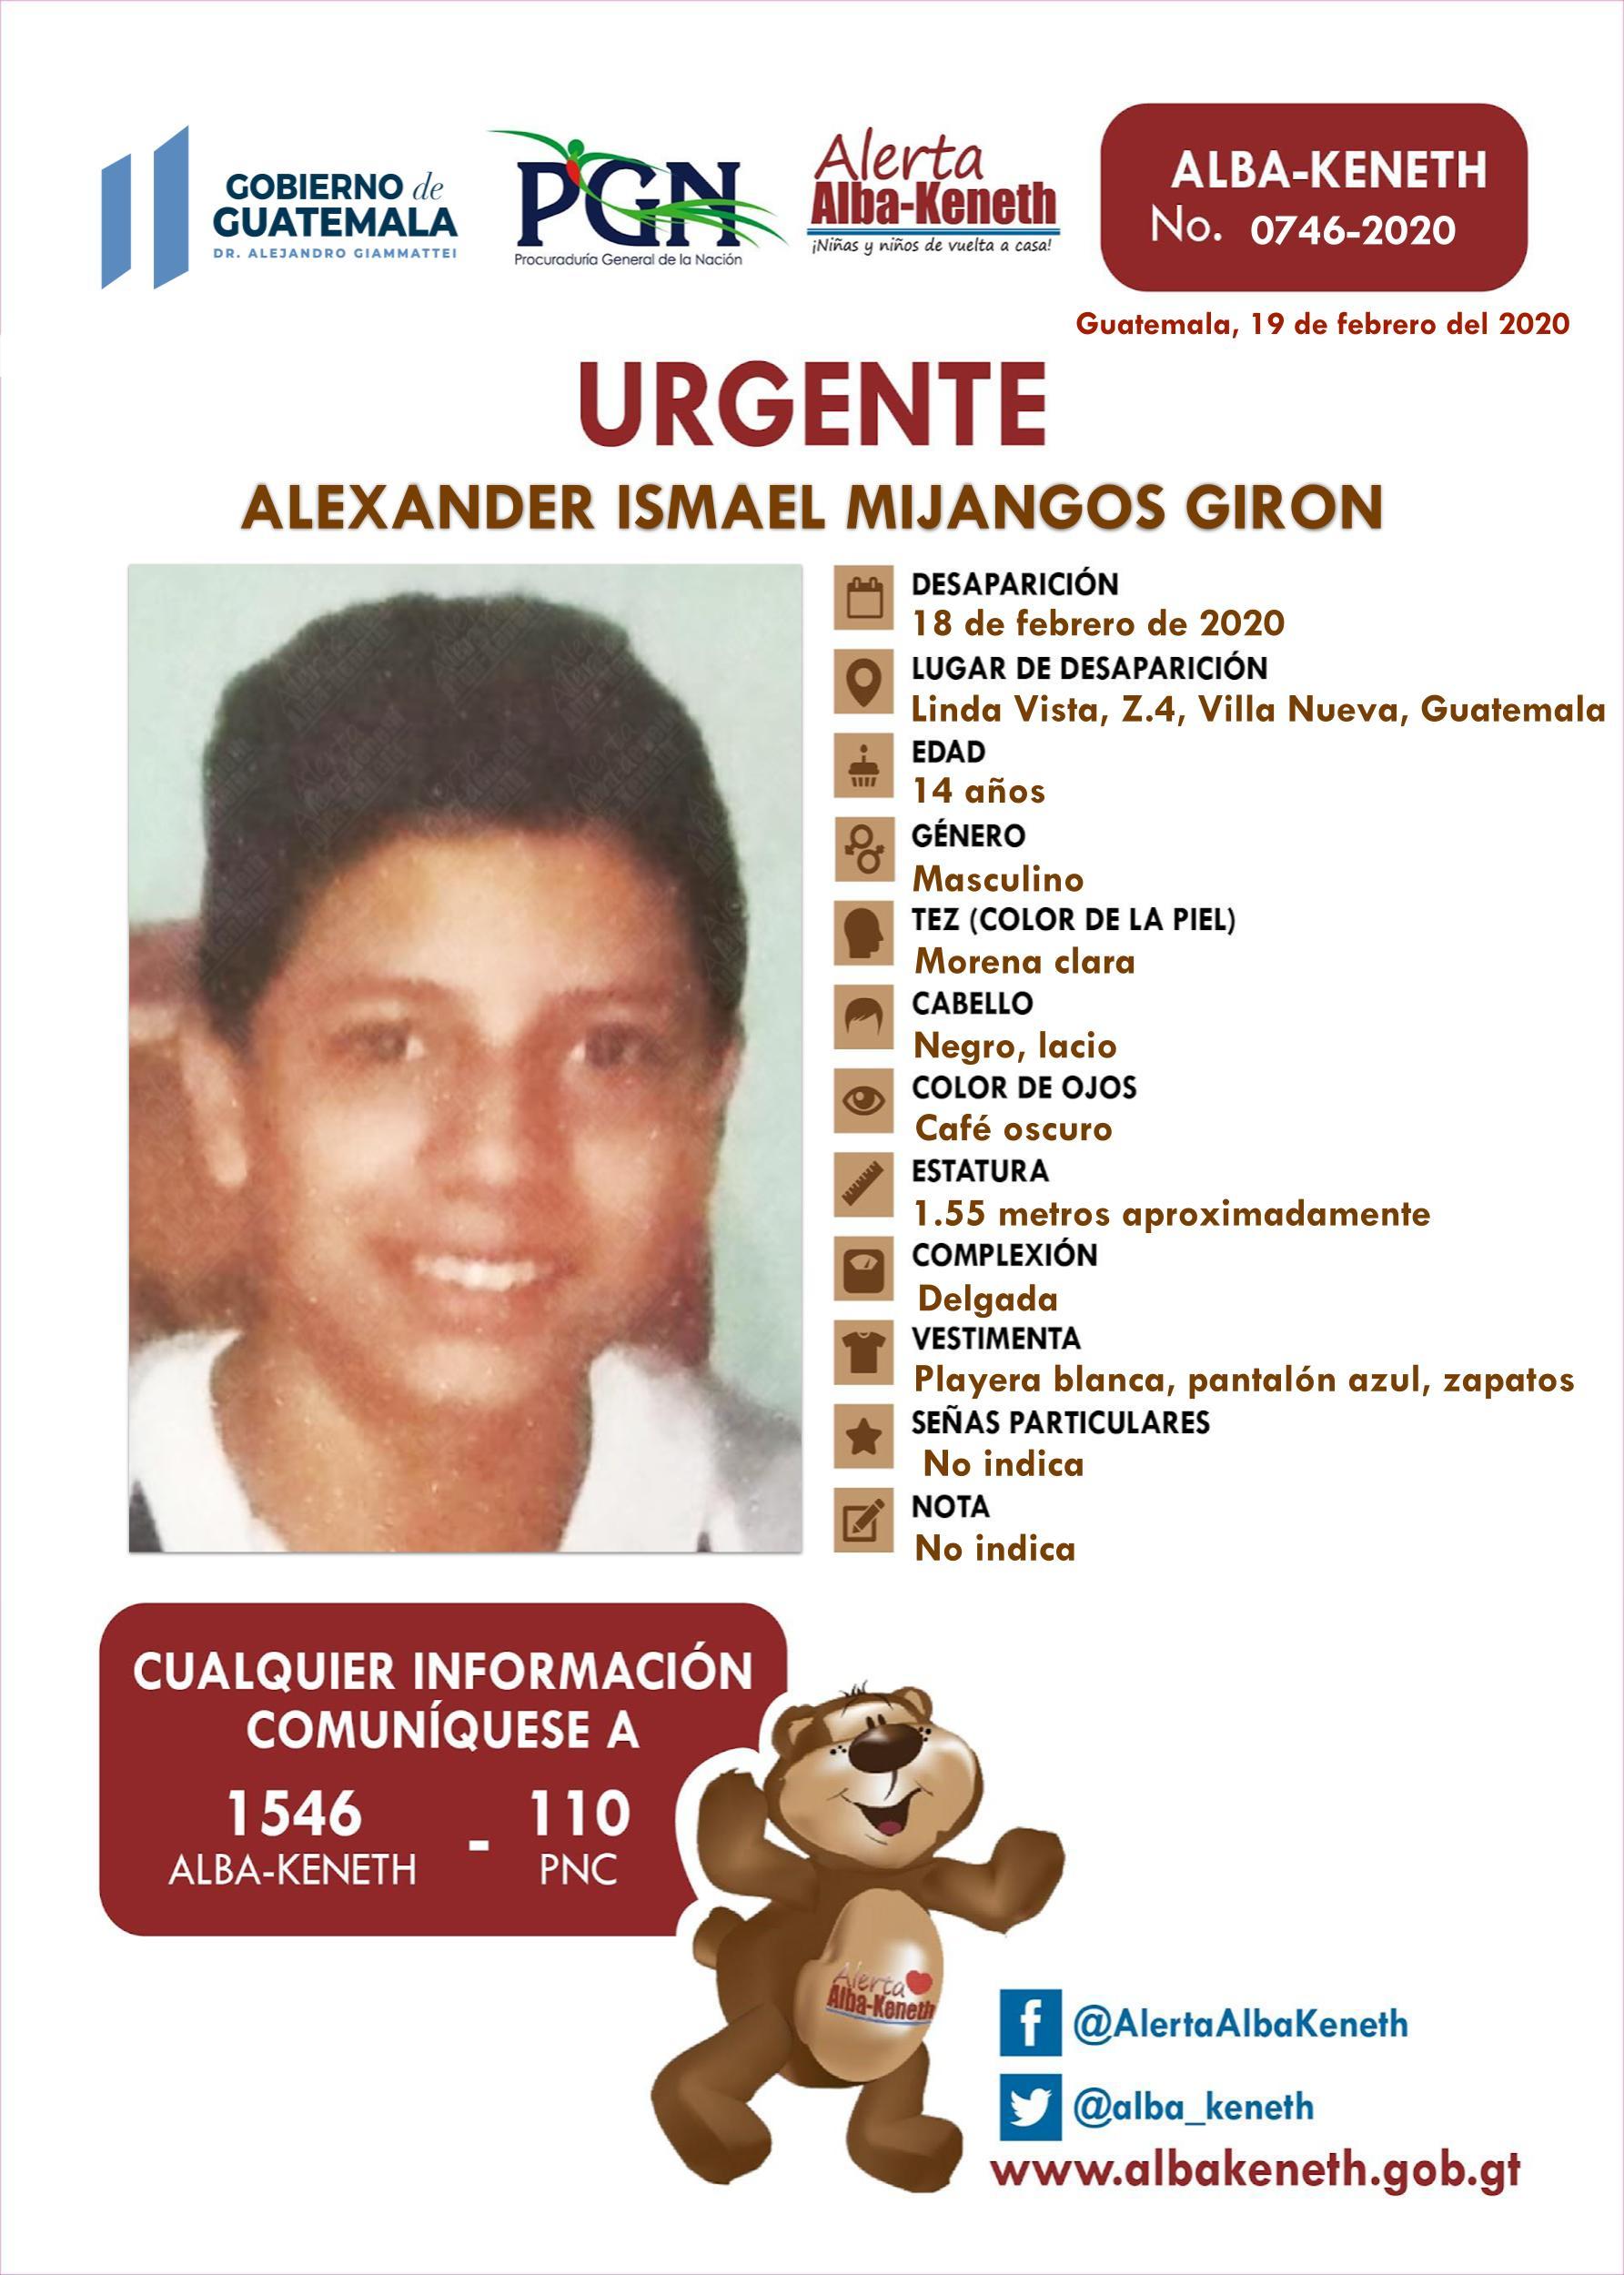 Alexander Ismael Mijangos Giron